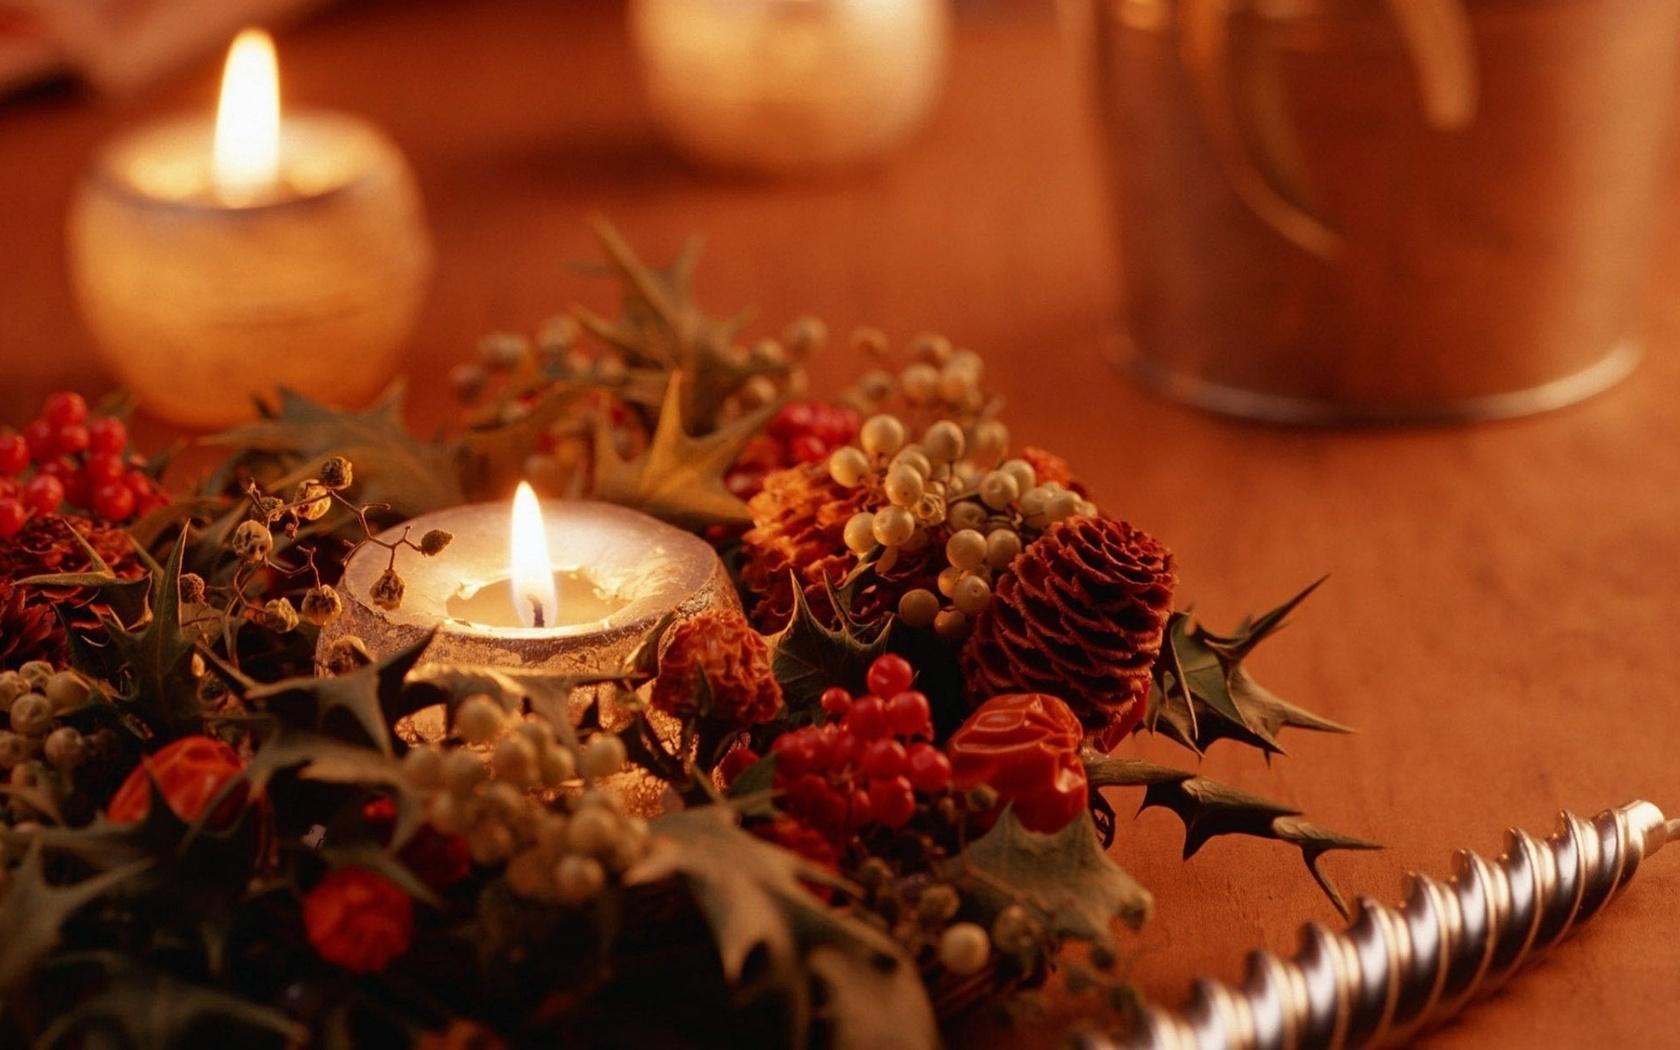 christmas-pictures-for-desktop-desktop-christmas-wallpaper-wp4604754